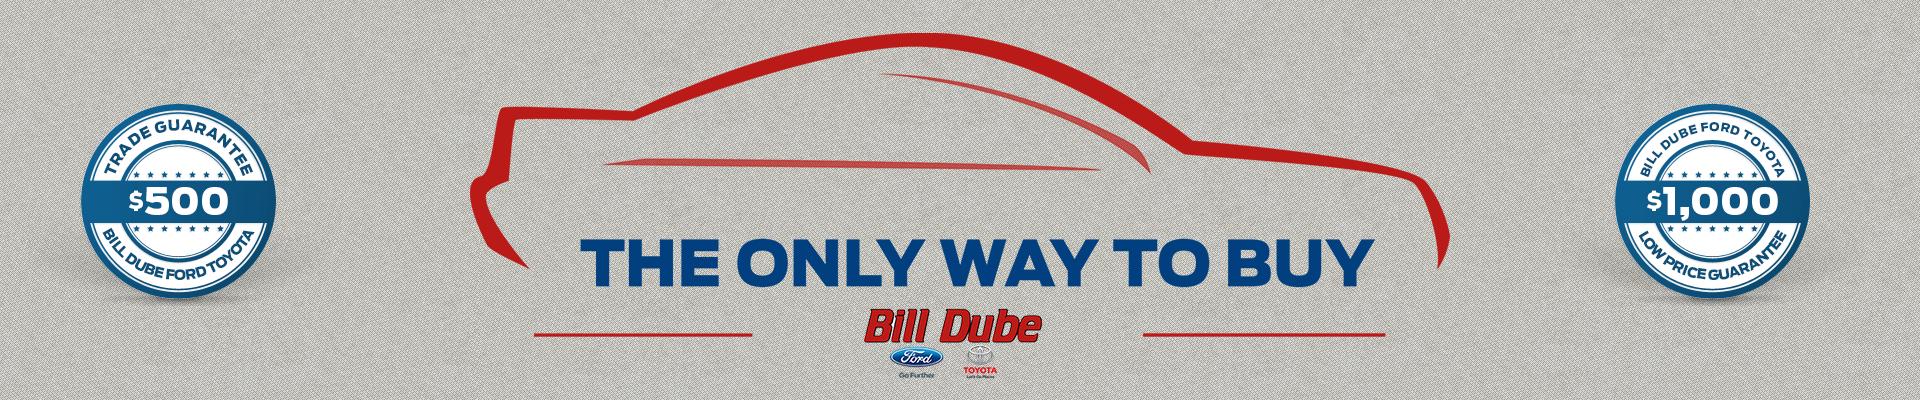 trade guarantee at bill dube